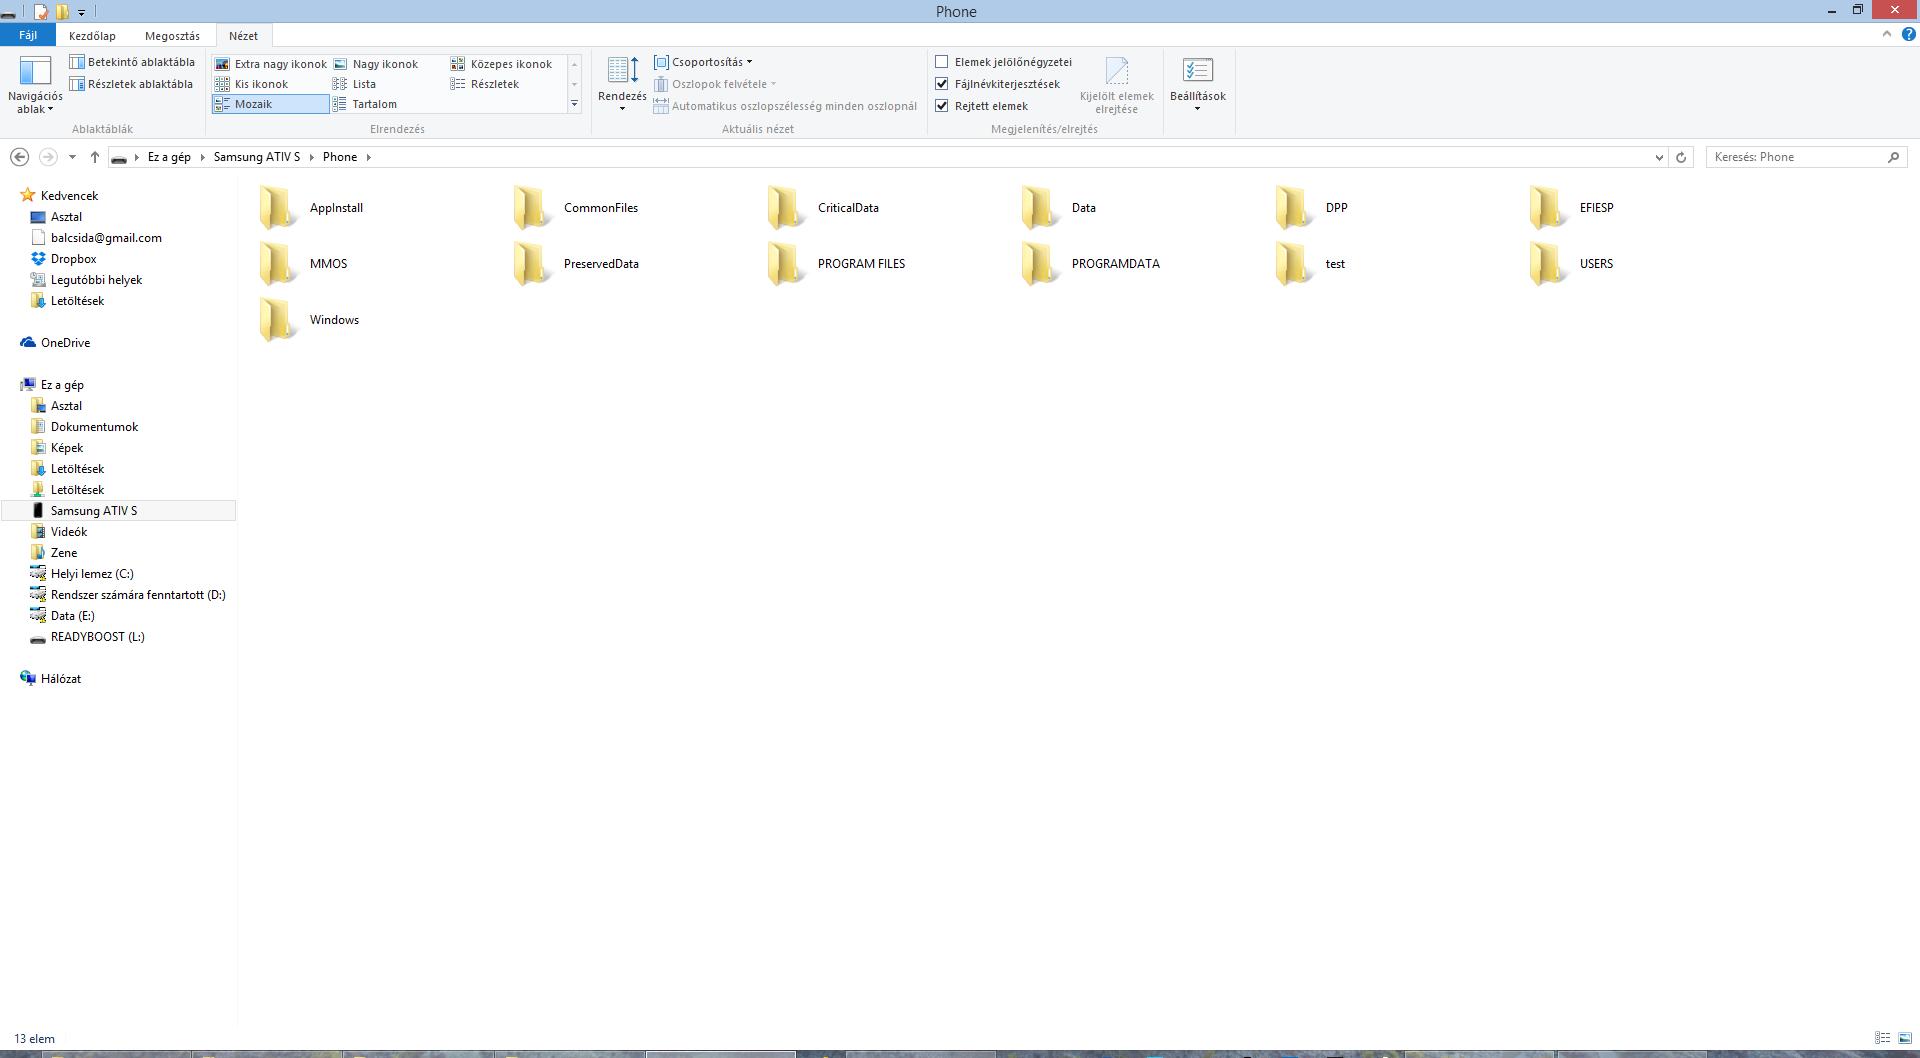 Screenshot 2014-05-17 15.43.53.png